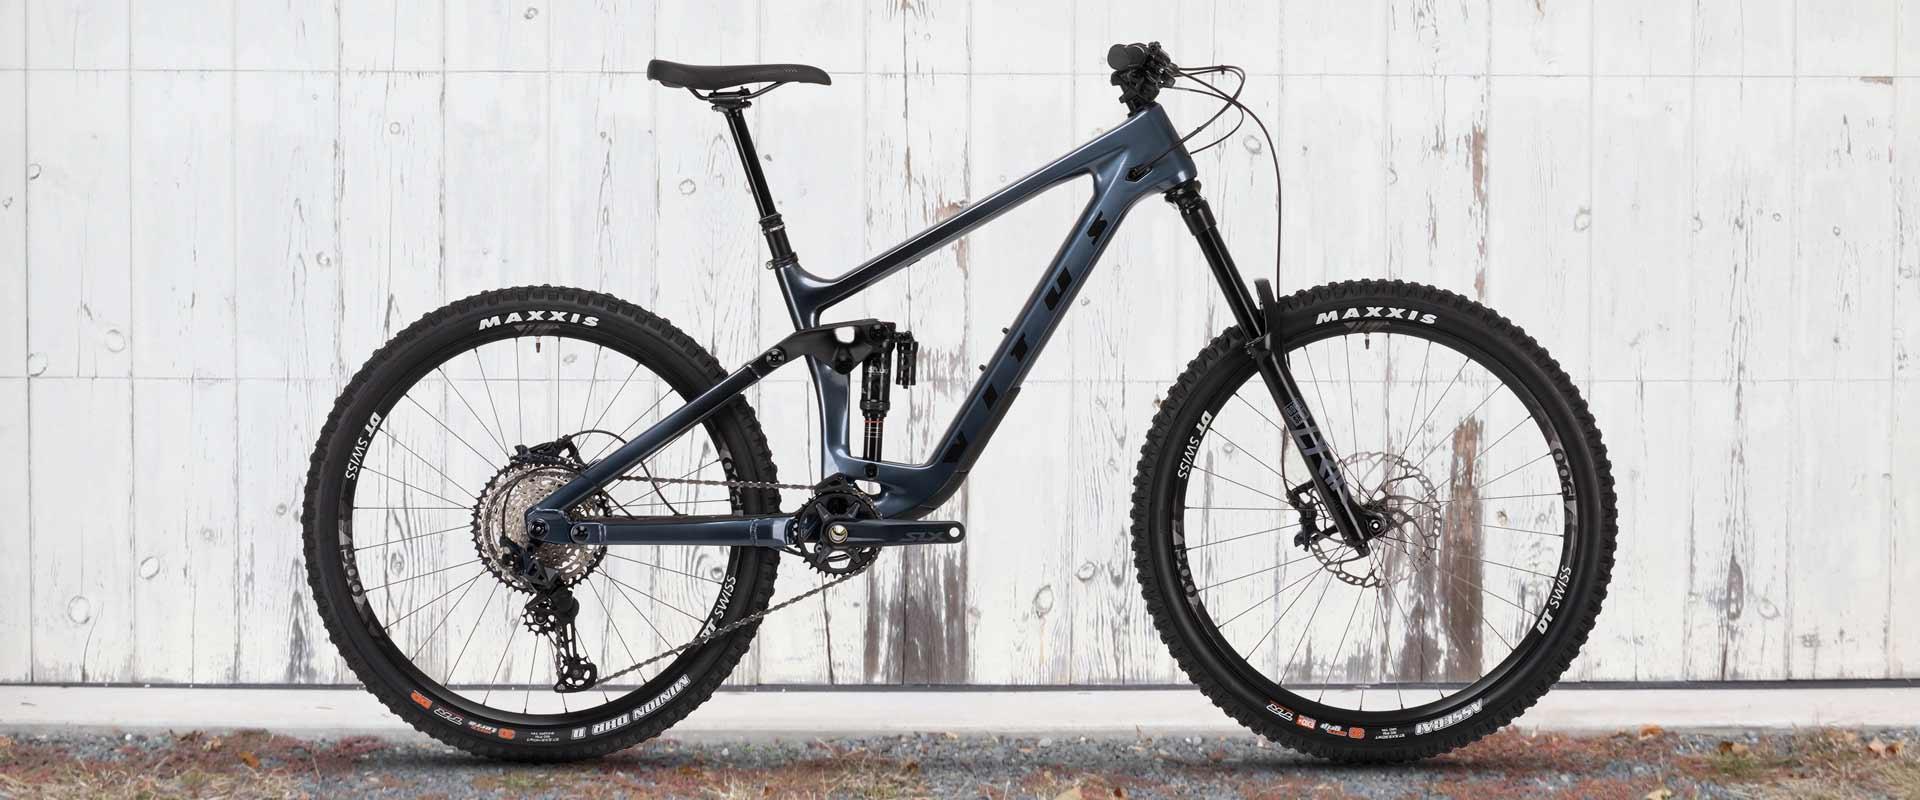 Vitus Sommet 27 CRS Mountain Bike